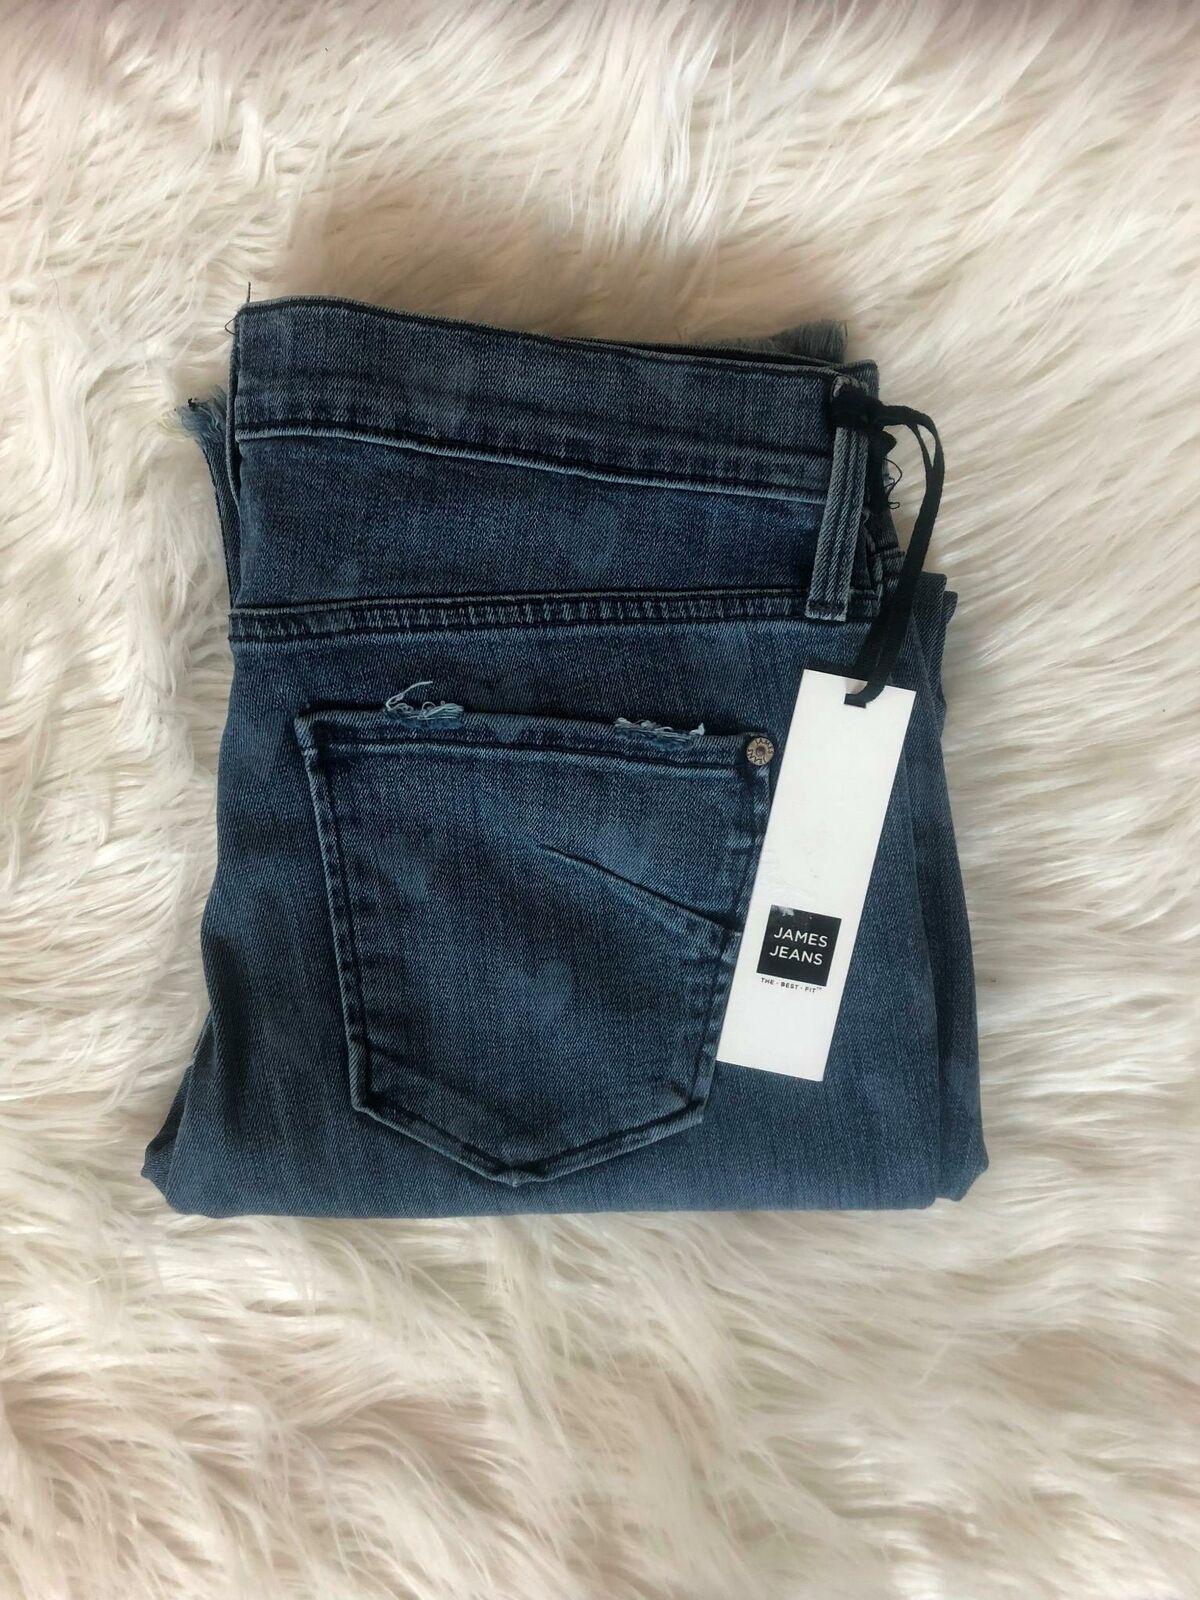 James Jeans Women's Size 30 Heart Printed Distressed Buddy Raw Hem Jeans CB58